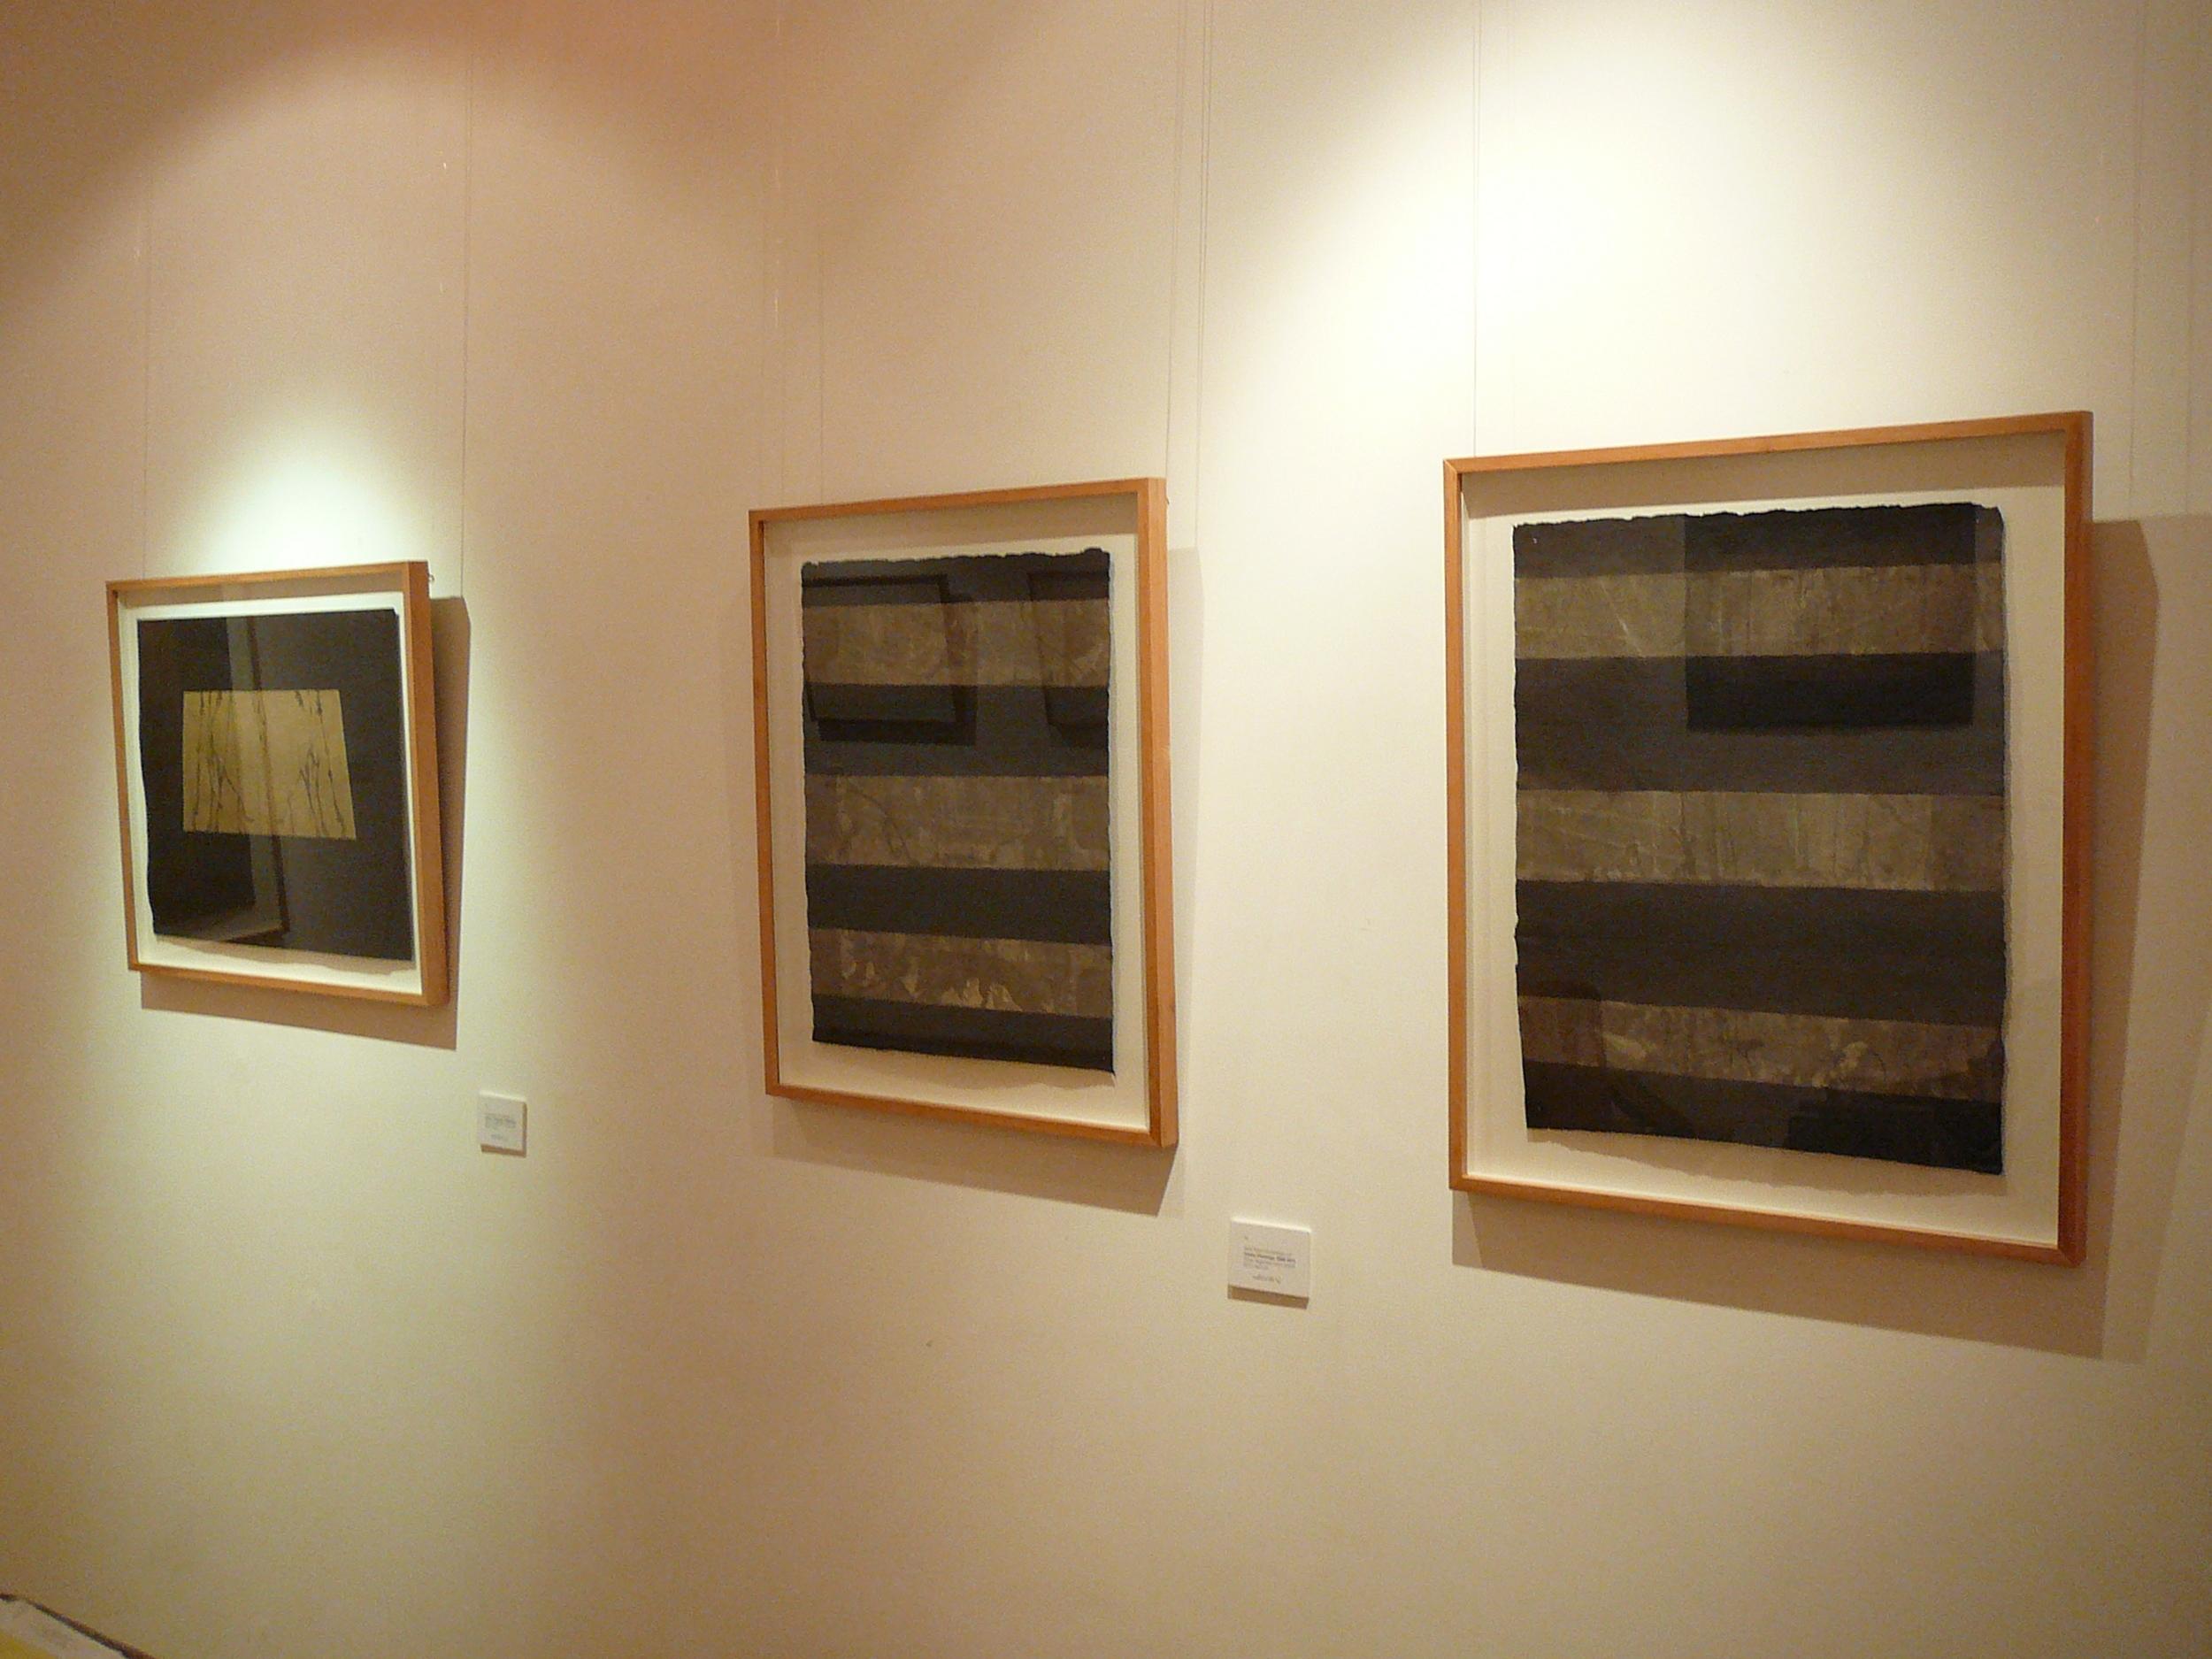 Cholango expo 2014 030 (1).JPG